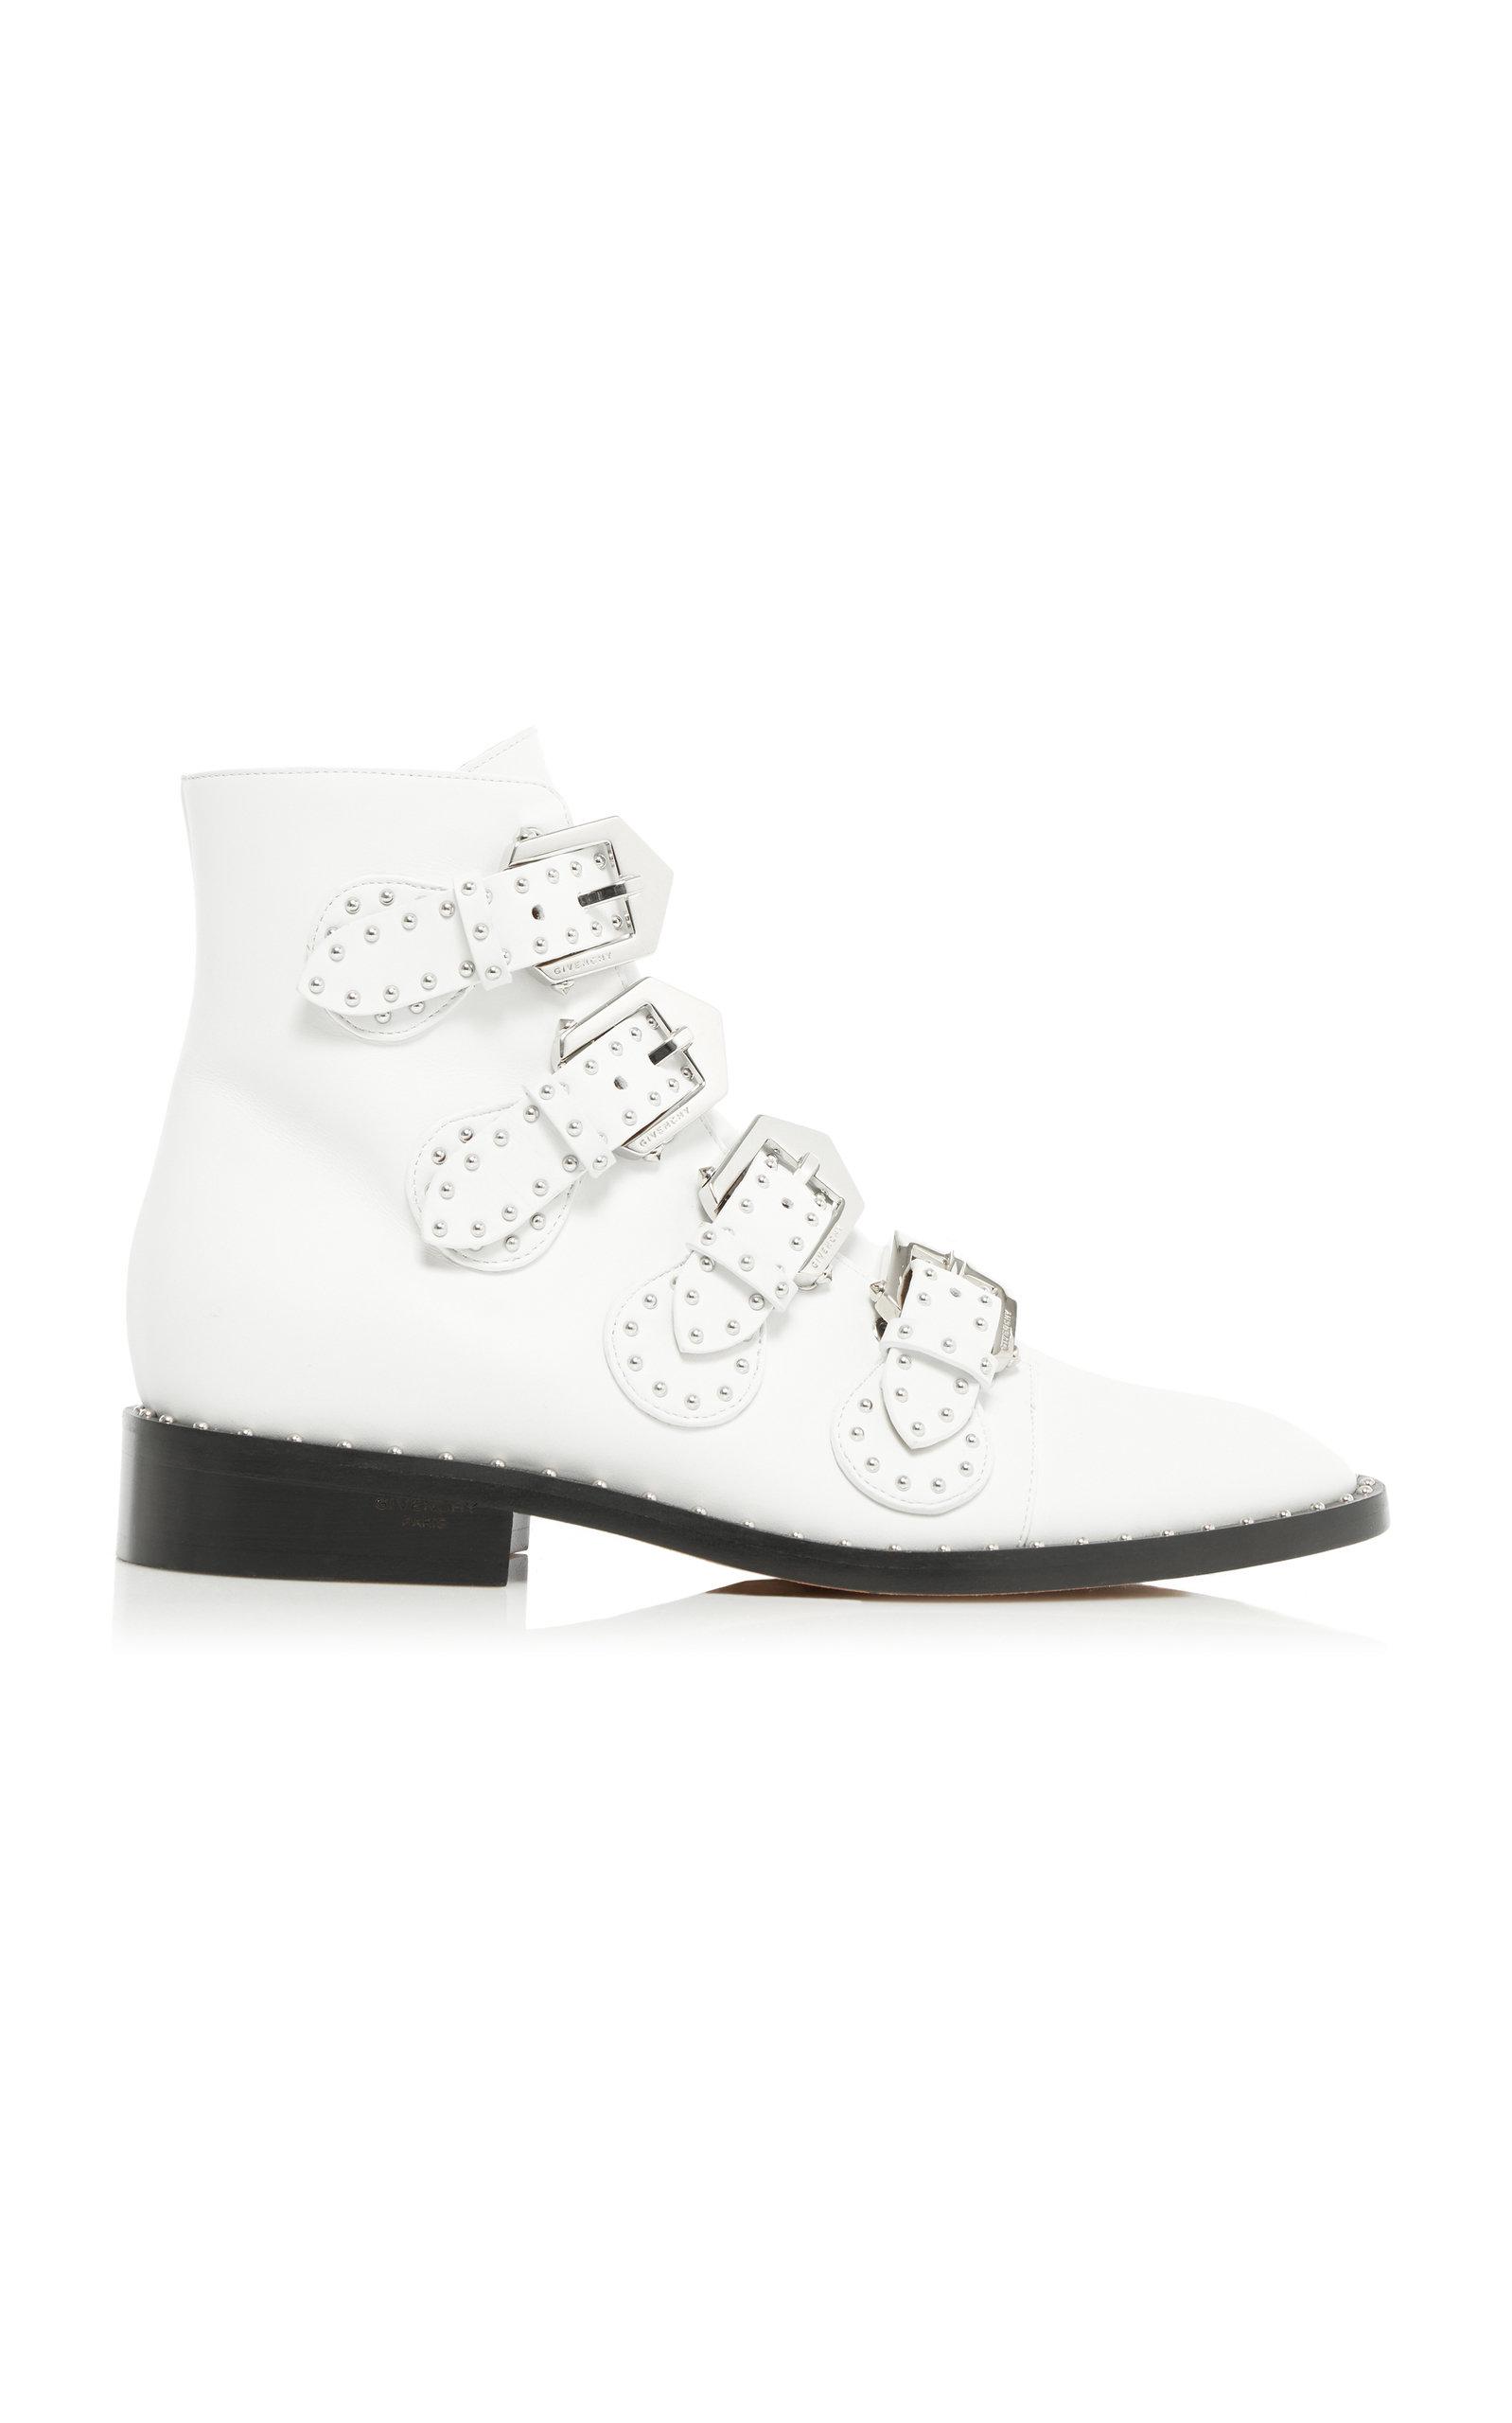 Givenchy Boots Elegant Stud-Embellished Leather Ankle Boots